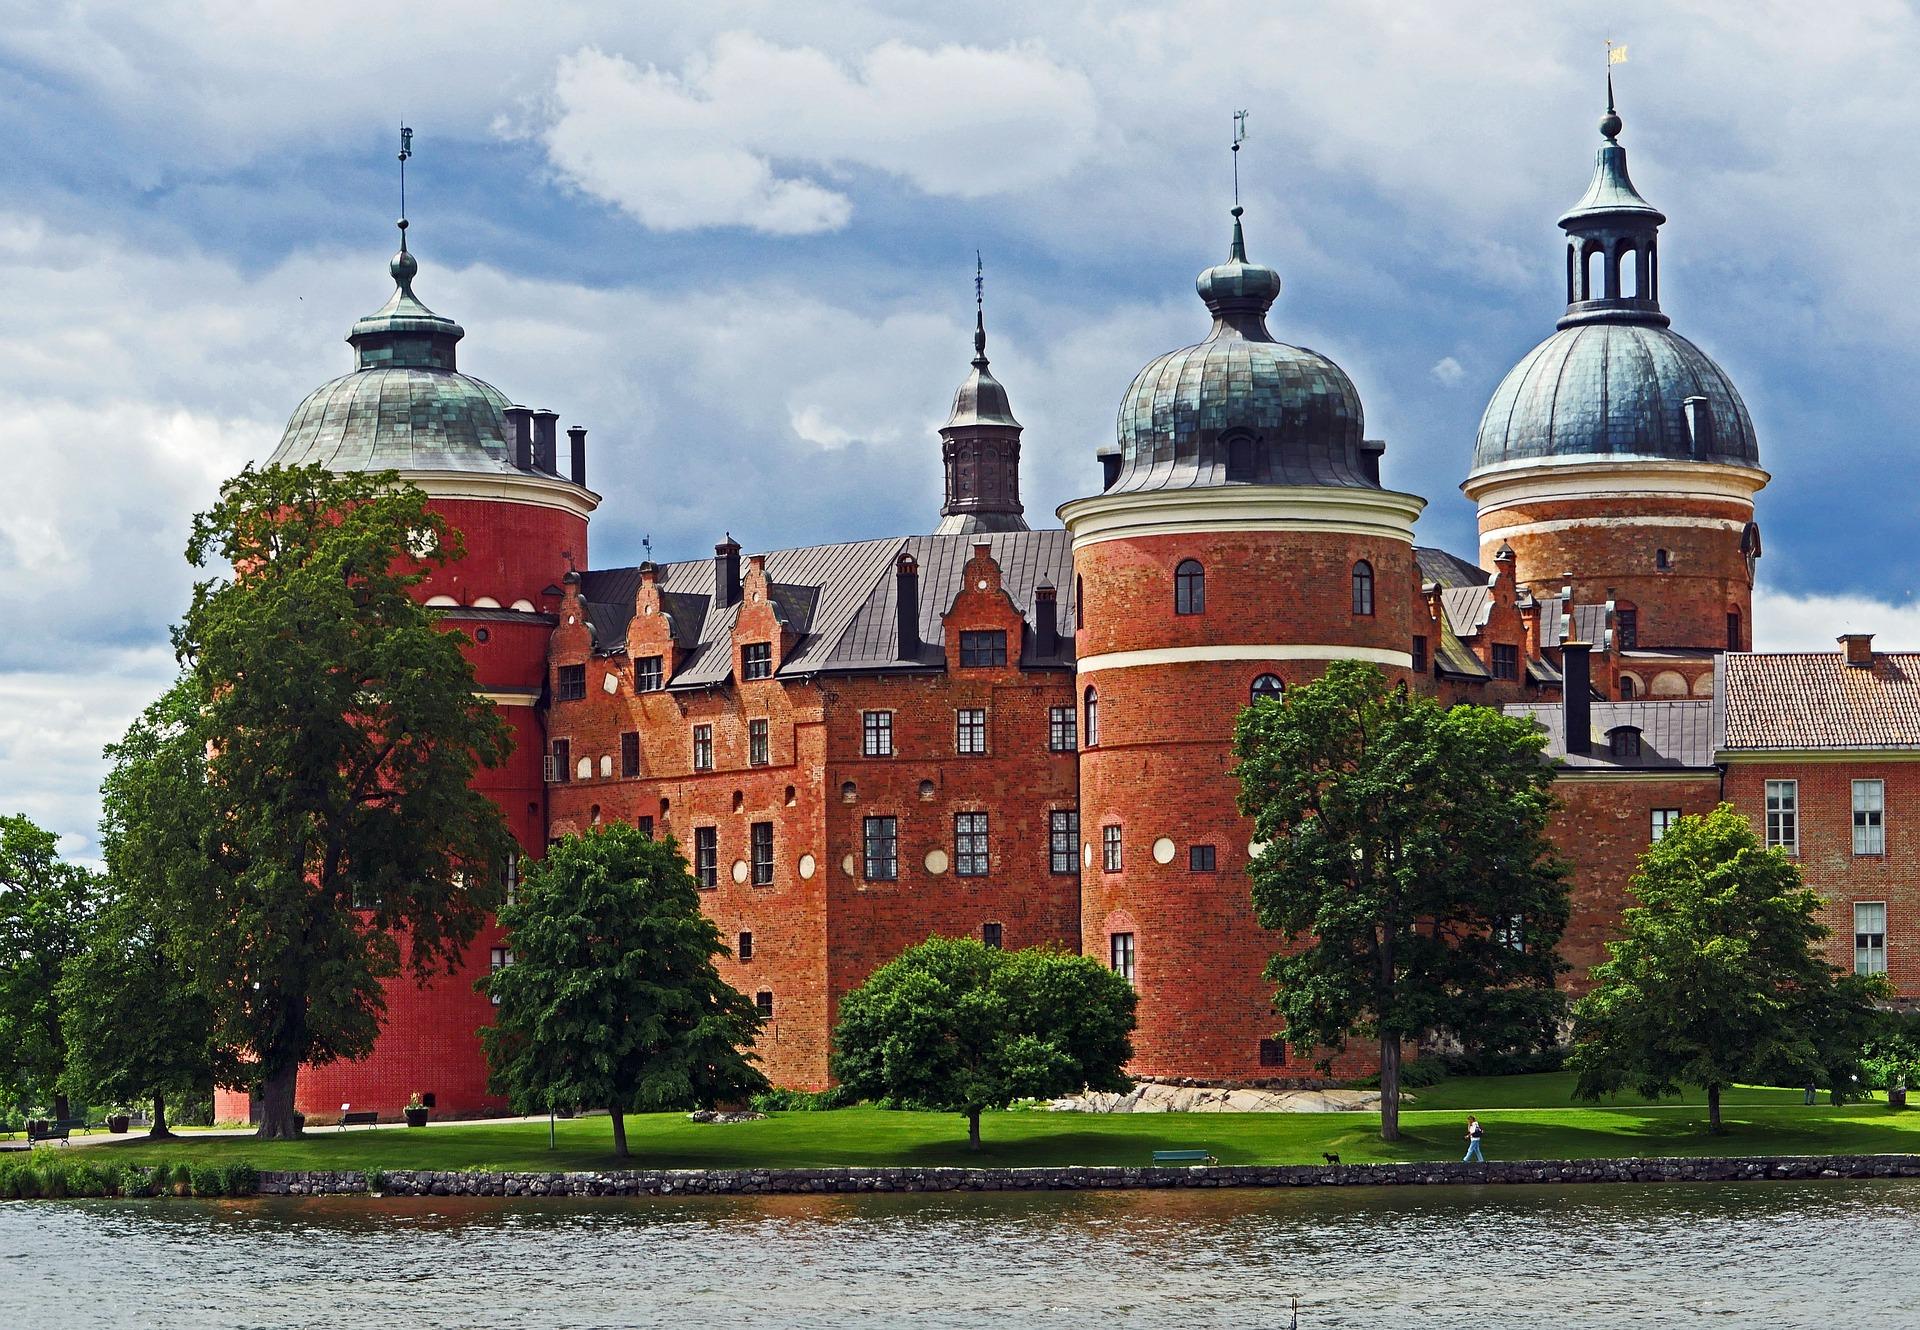 Der Palast Gripsholm